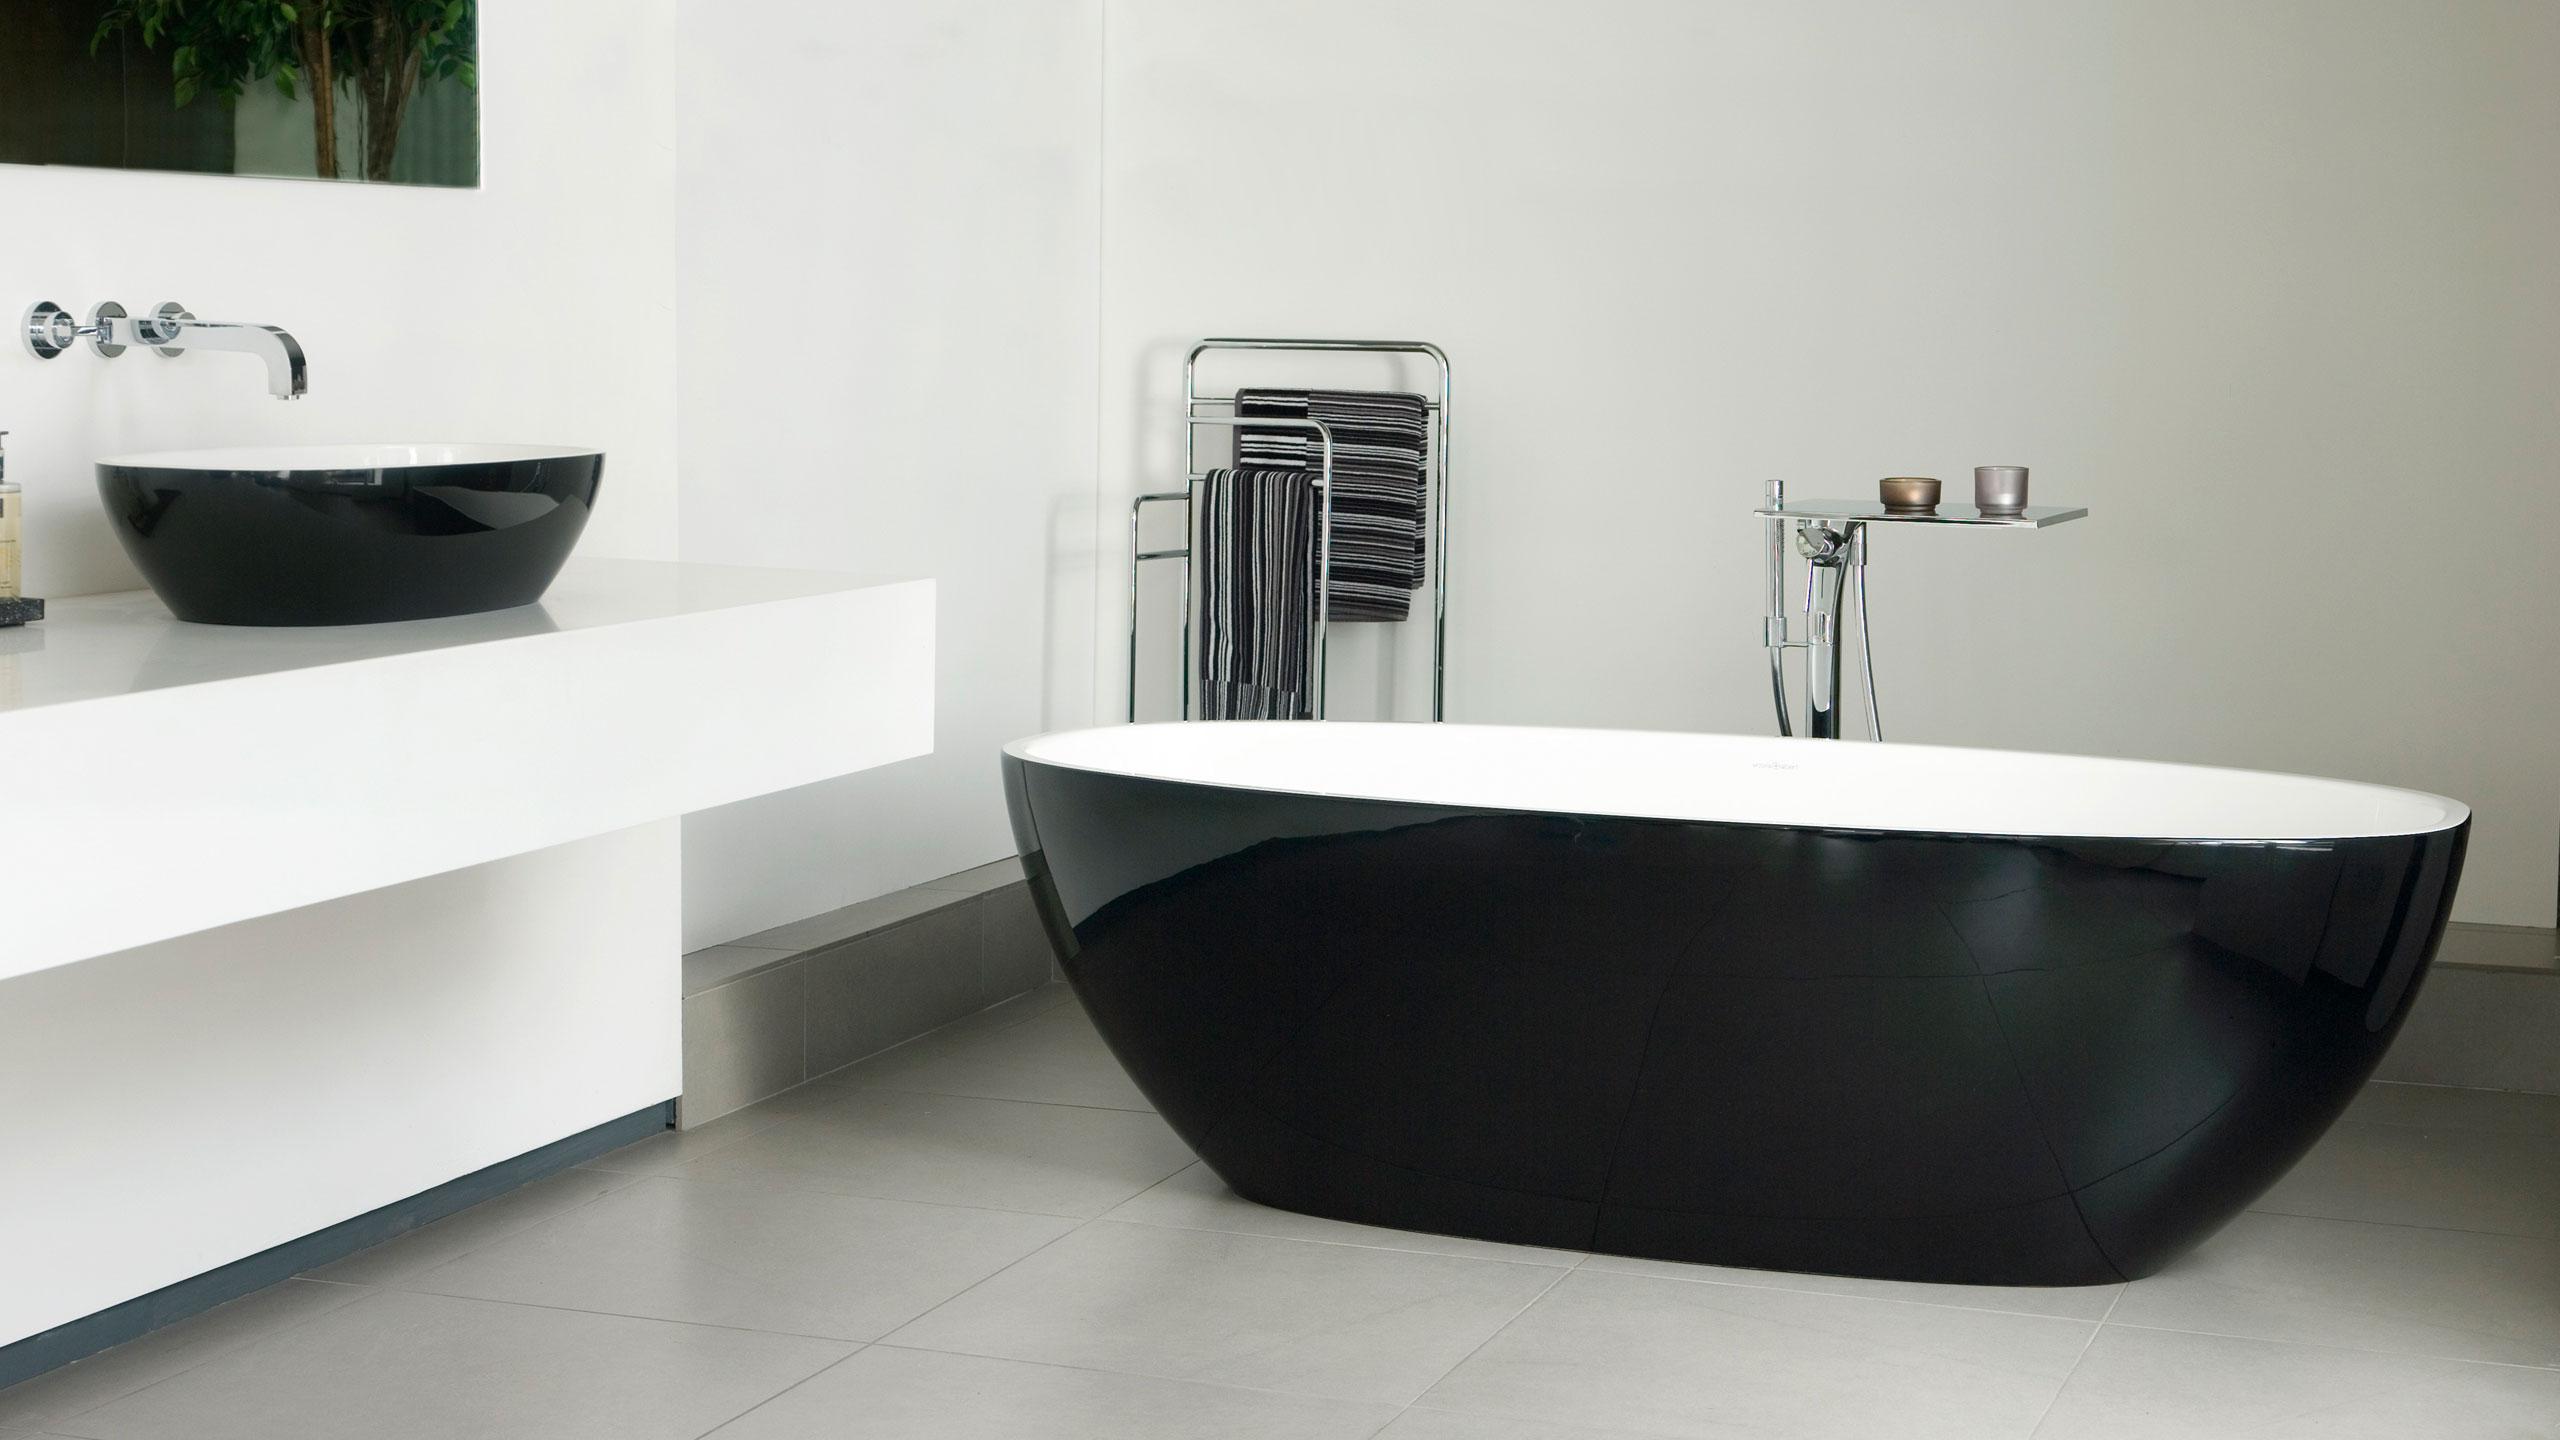 https://designerpages.s3.amazonaws.com/assets/61000371/Barcelona_Gallery_3black_EU.jpg